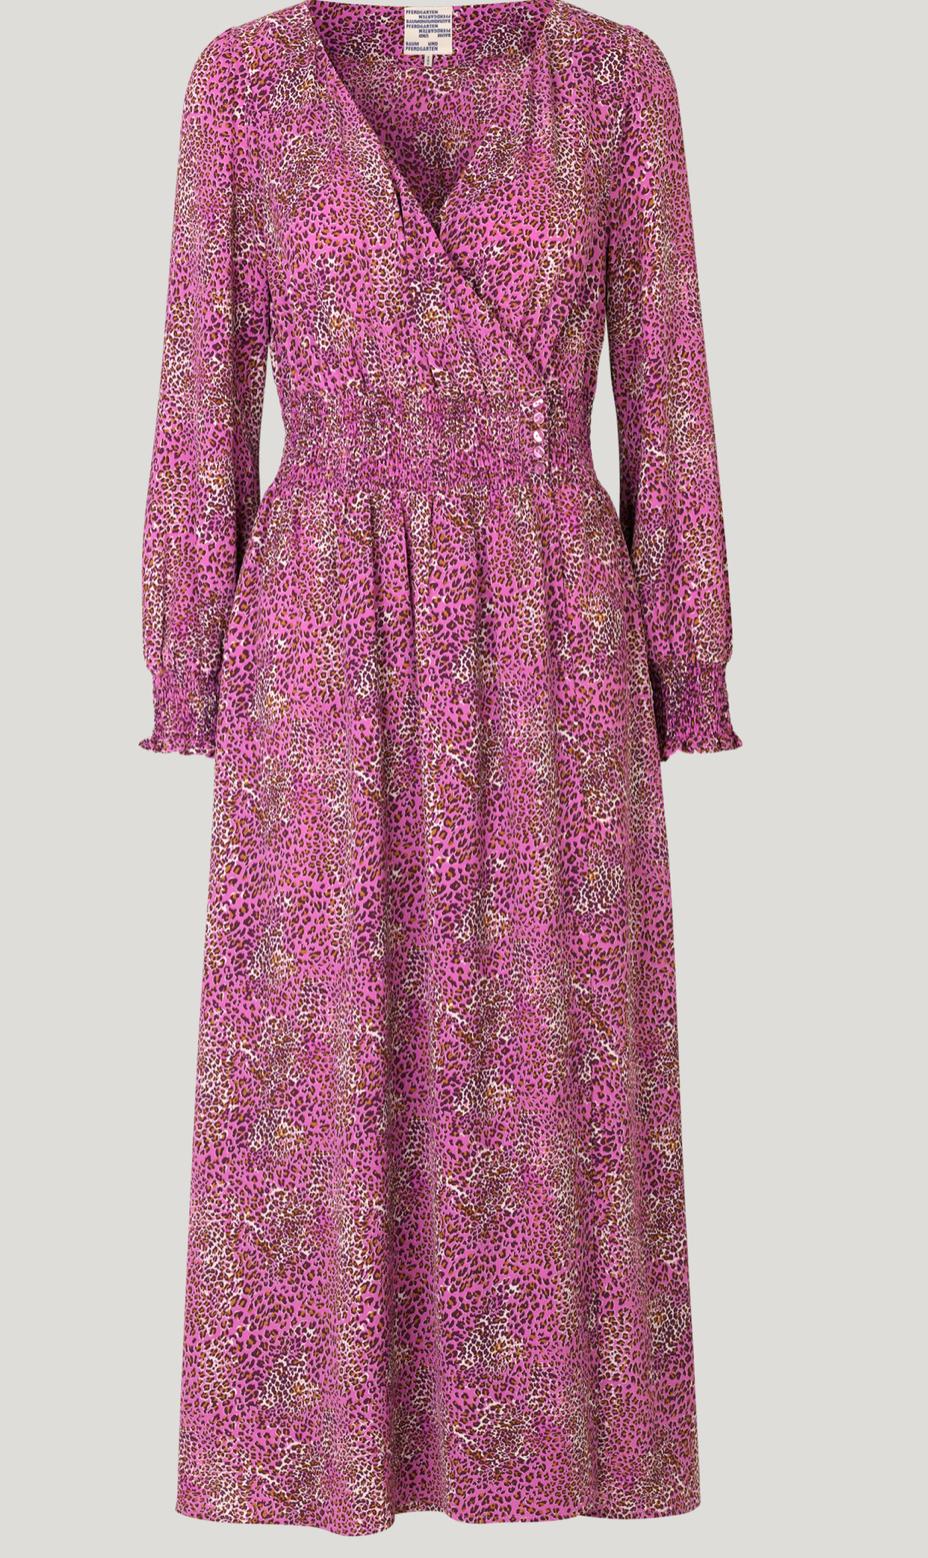 Azia dress-1